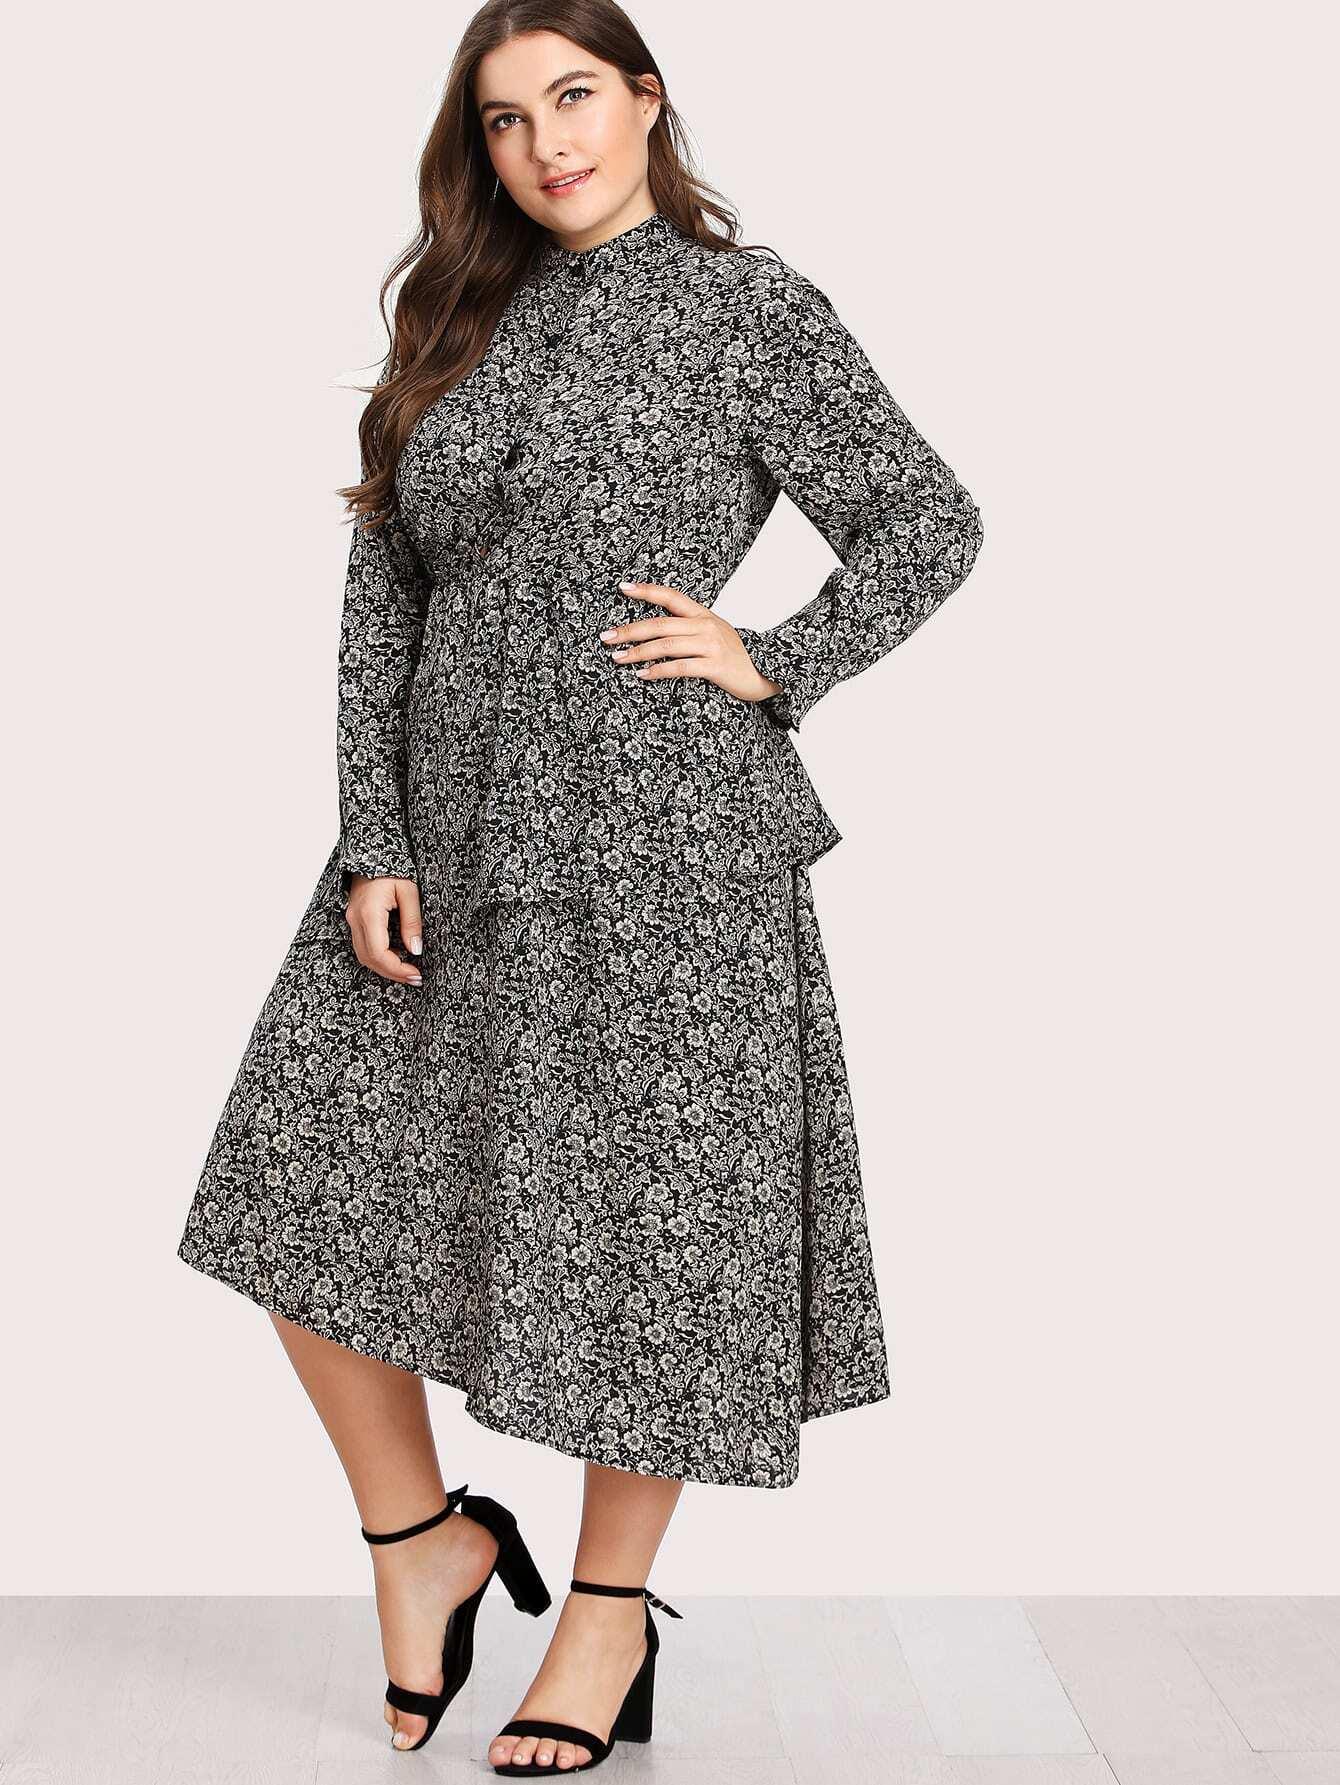 Calico Print Tiered Asymmetrical Hem Dress patchwork print tiered hem halter dress